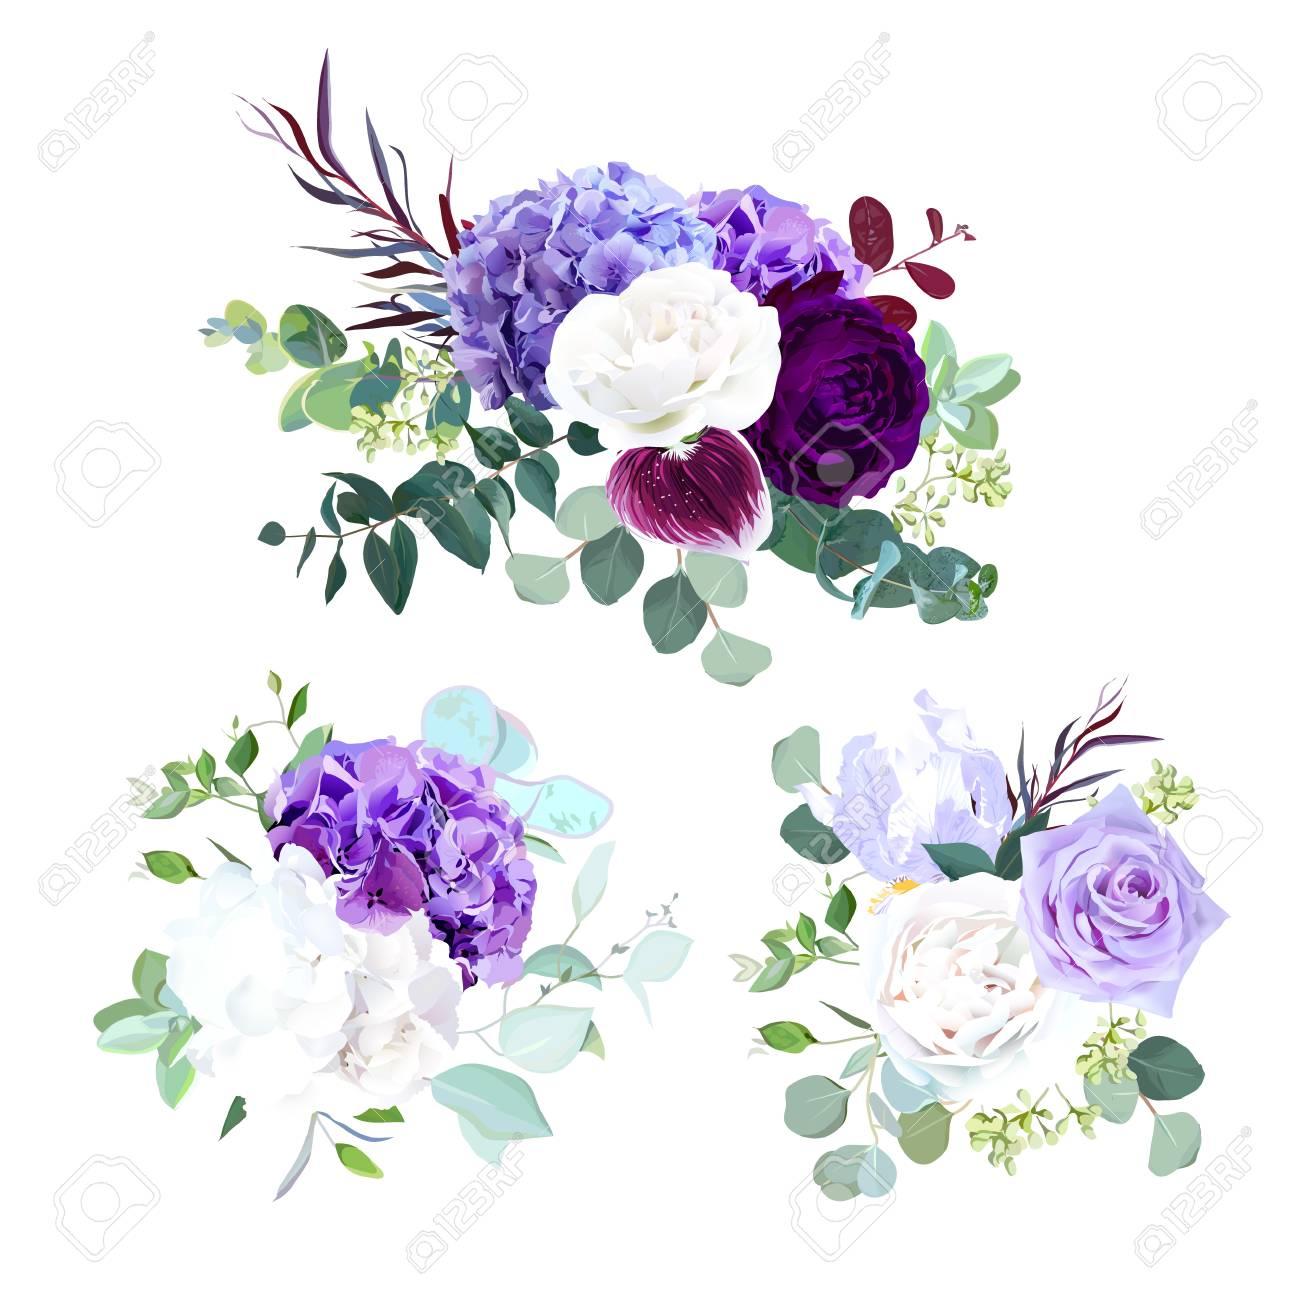 Elegant Seasonal Dark Flowers Vector Design Wedding Bouquets Purple Royalty Free Cliparts Vectors And Stock Illustration Image 109885189